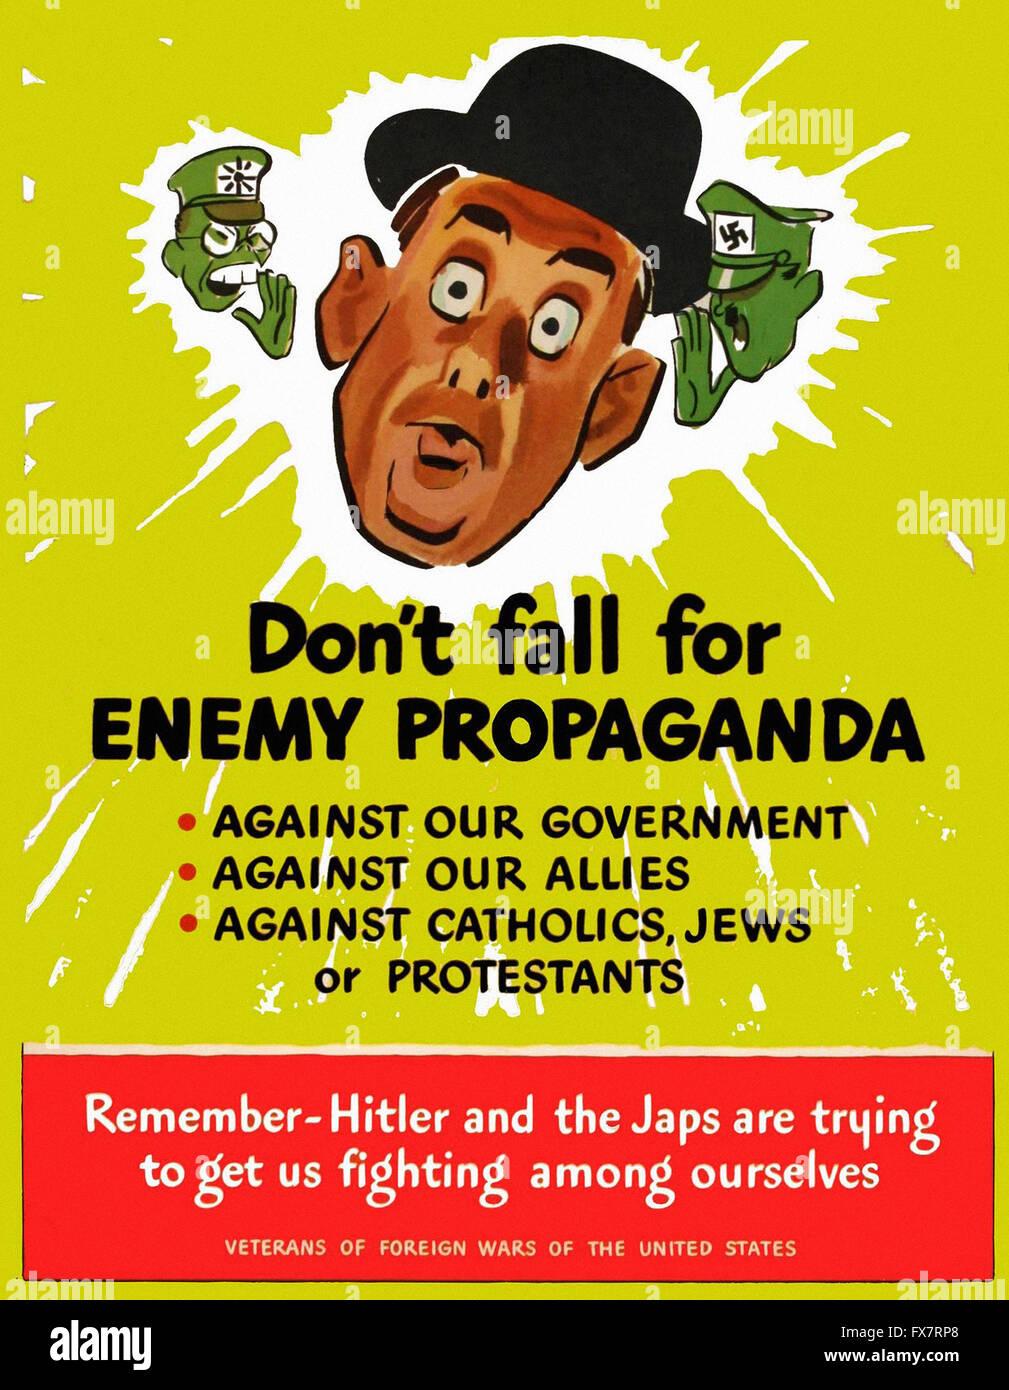 Don't Fall For Enemy Propaganda - World War II - U.S propaganda Poster - Stock Image